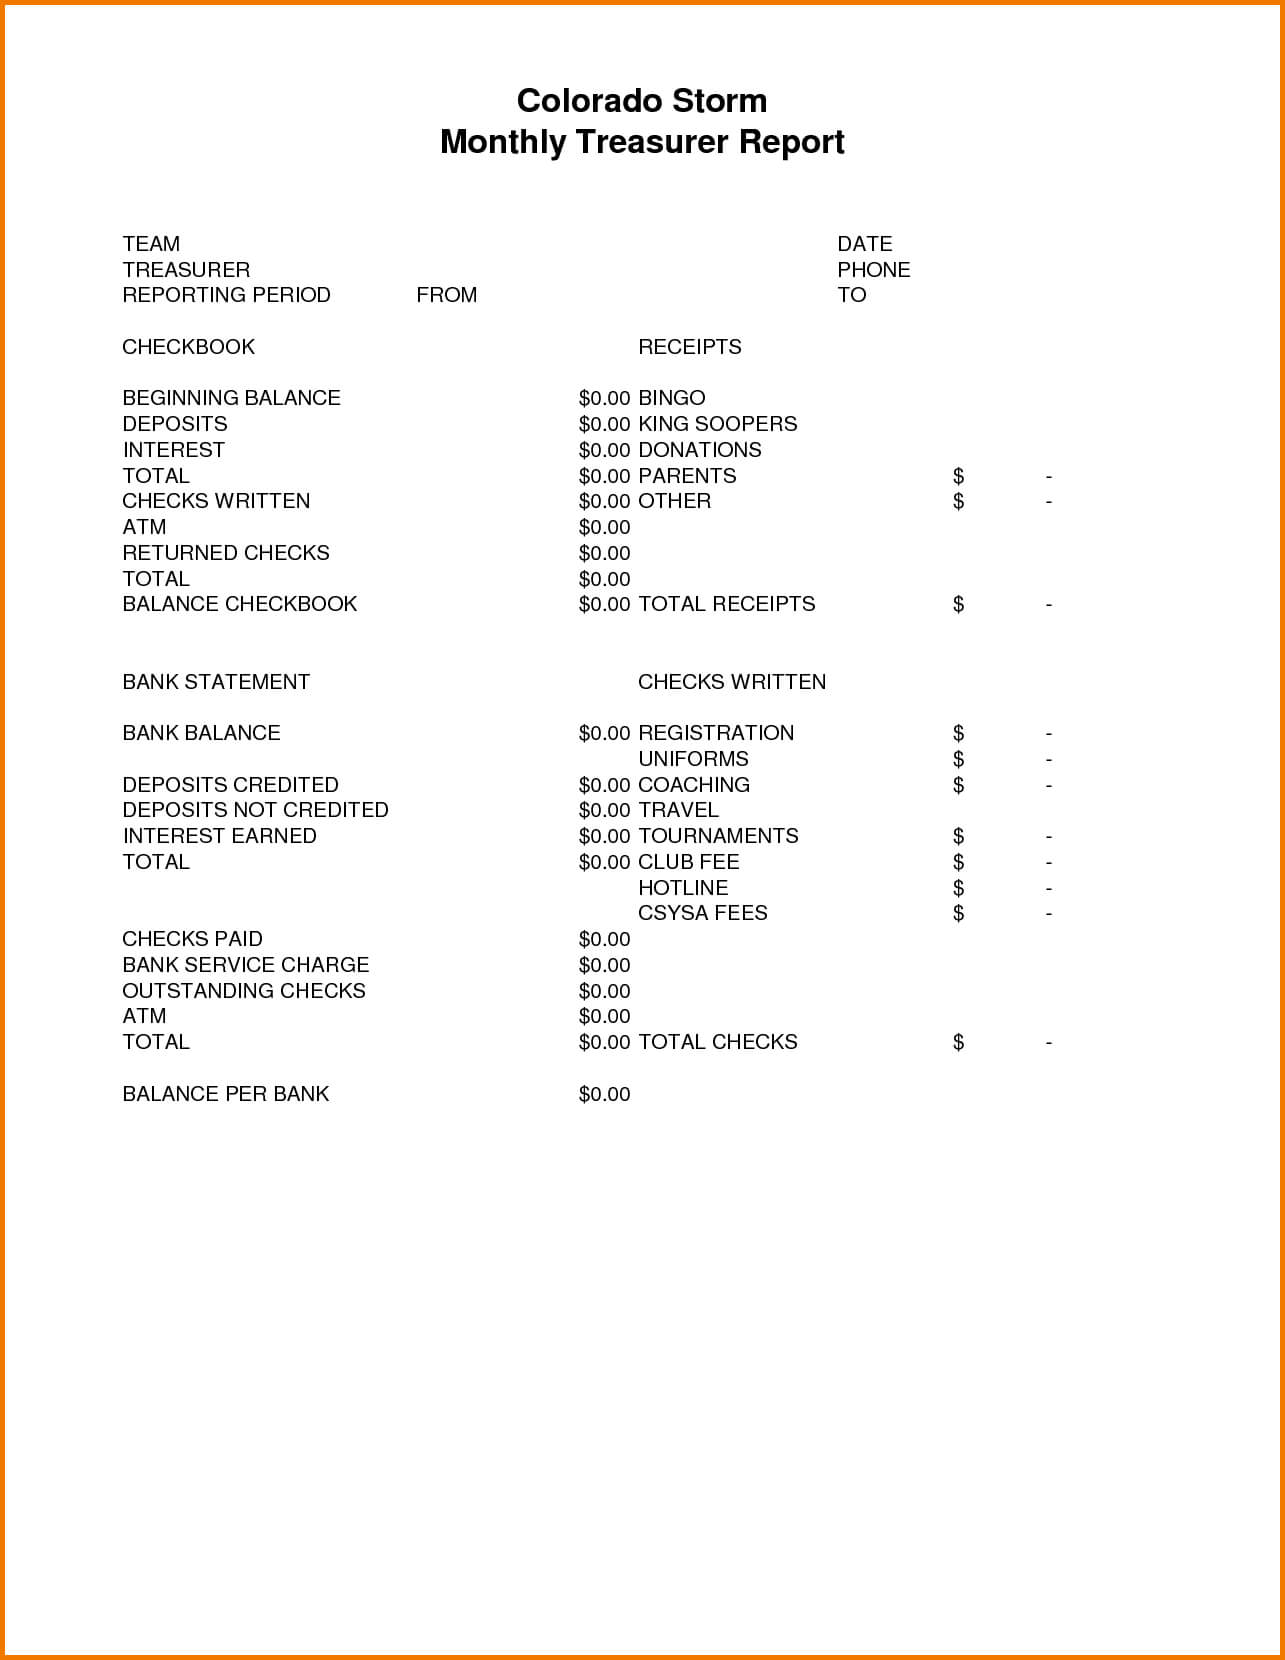 Free L Treasurer Report Template Treasurers For Non Profit In Treasurer's Report Agm Template